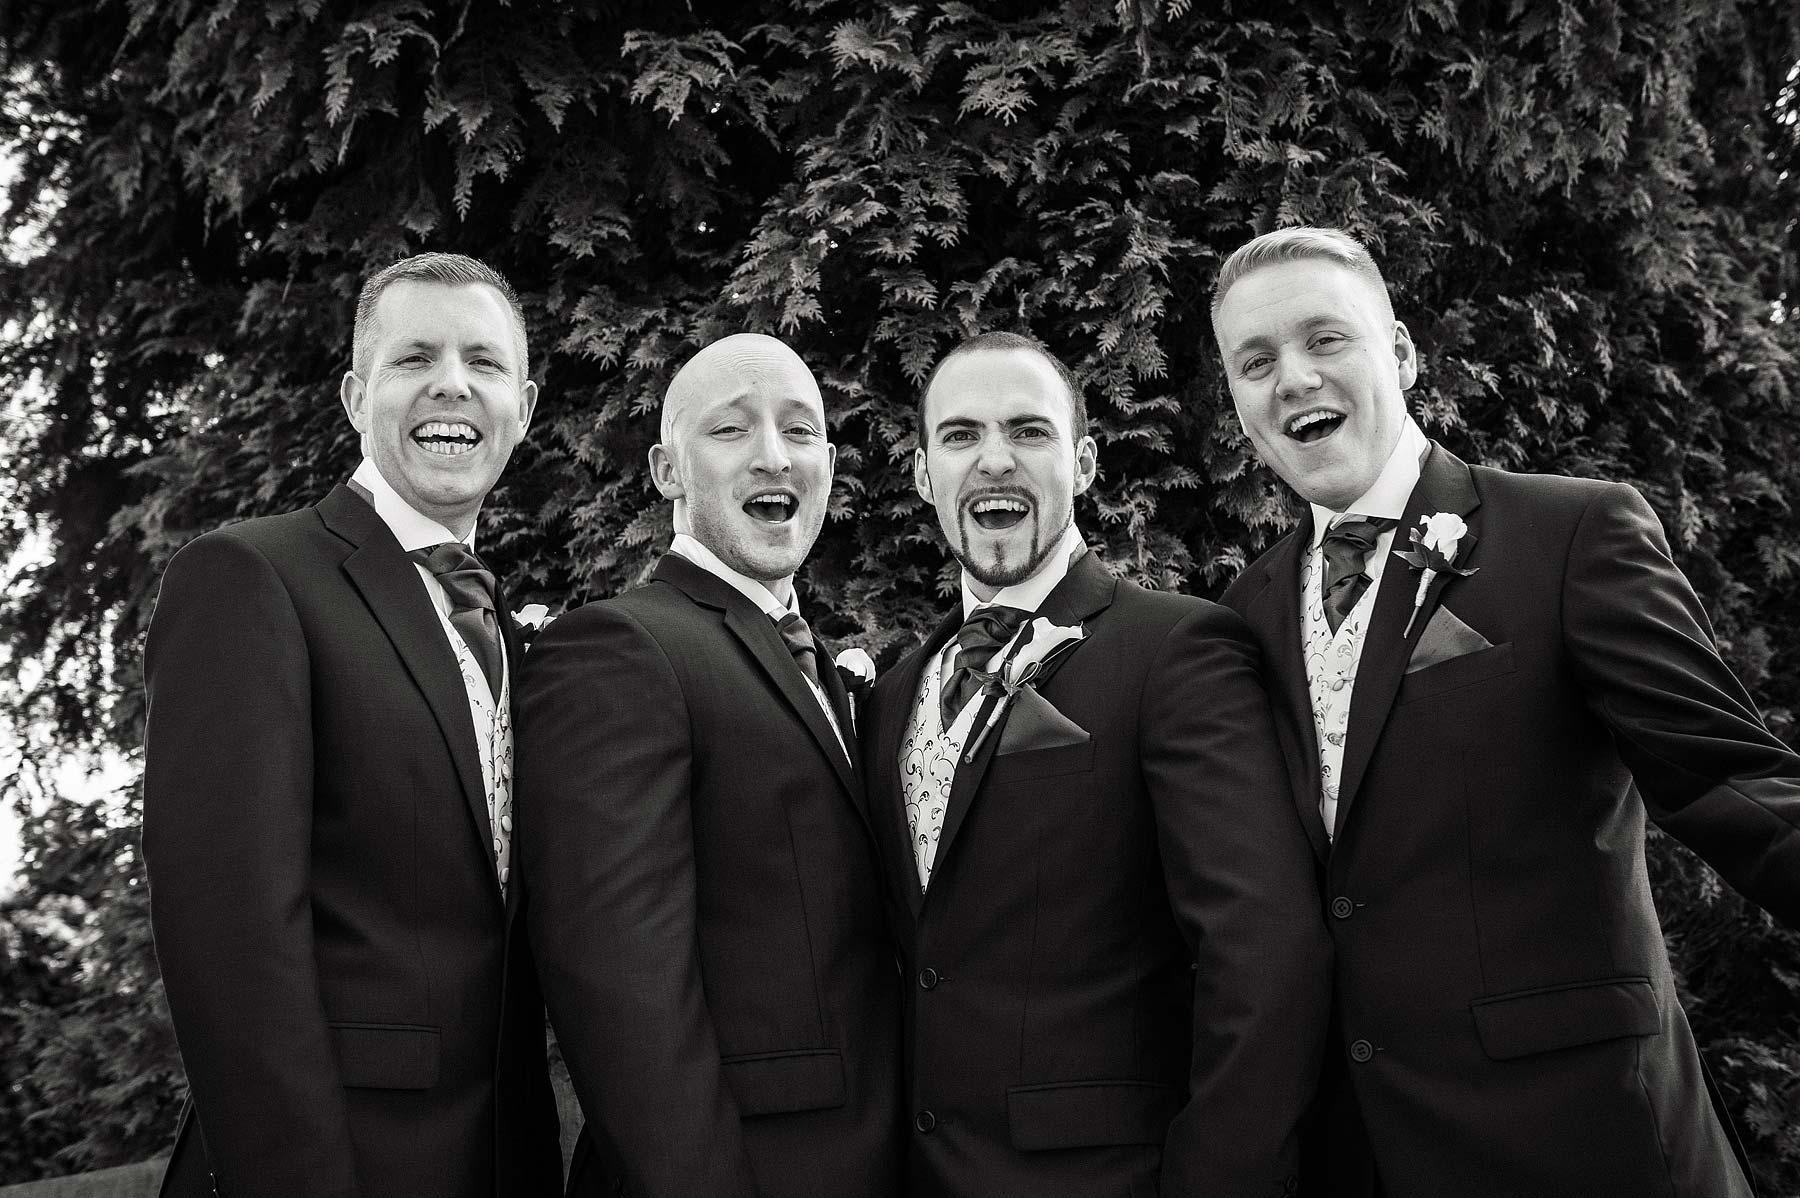 albright-hussey-manor-wedding-photographers-010